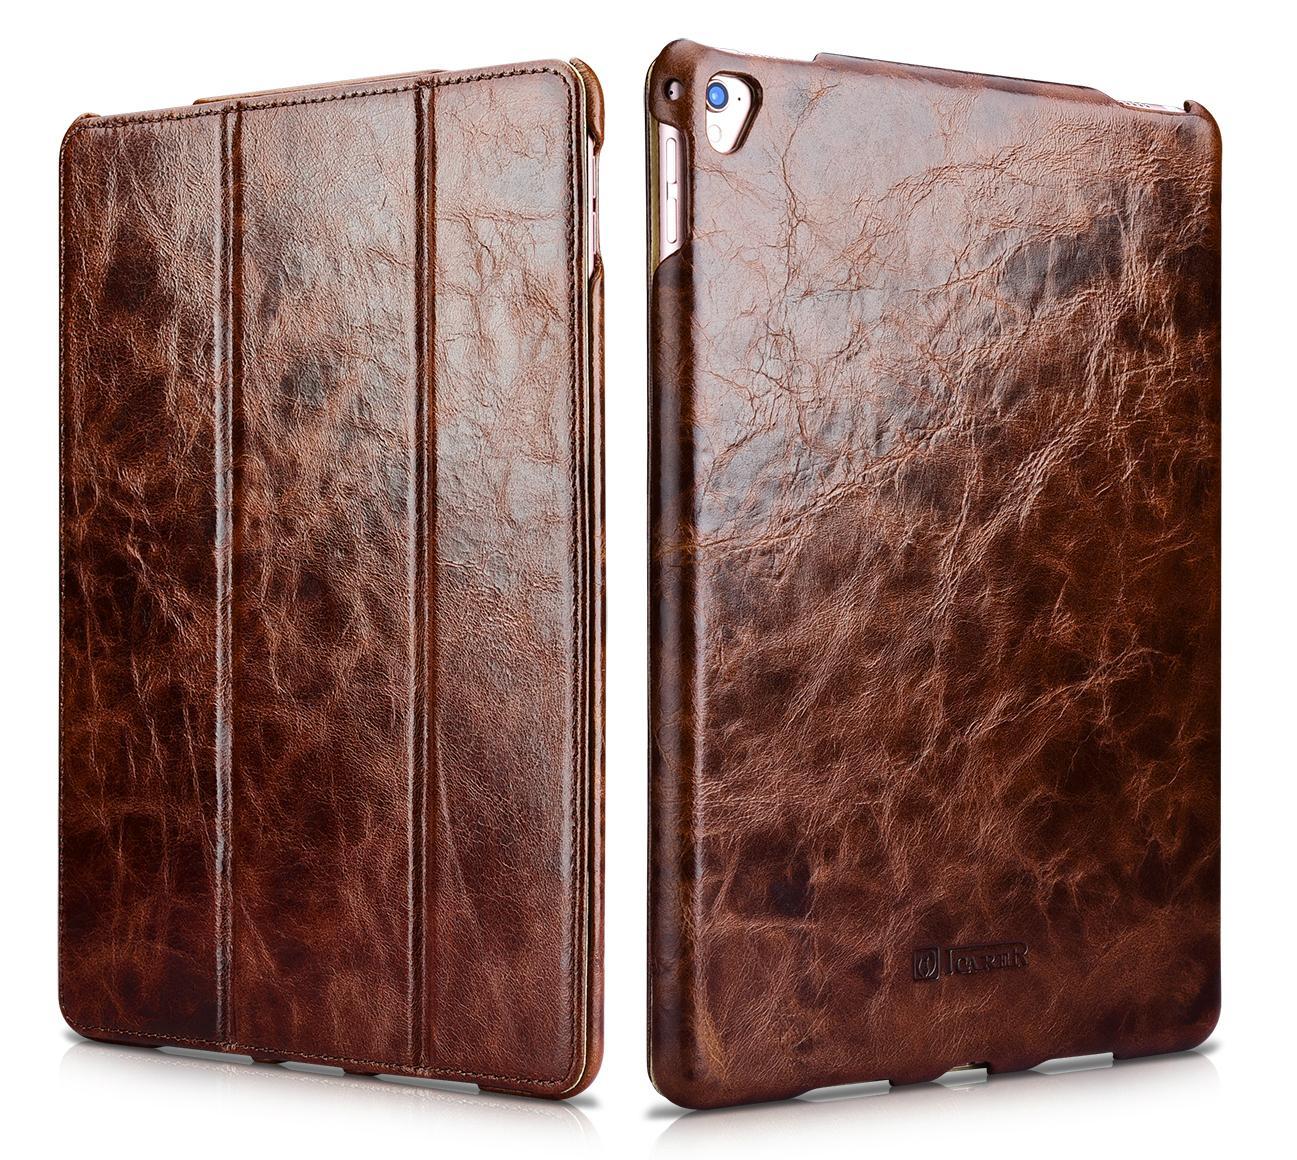 iCarer iPad Pro 9.7 inch Oil Wax Vintage Genuine Leather Folio Case 1